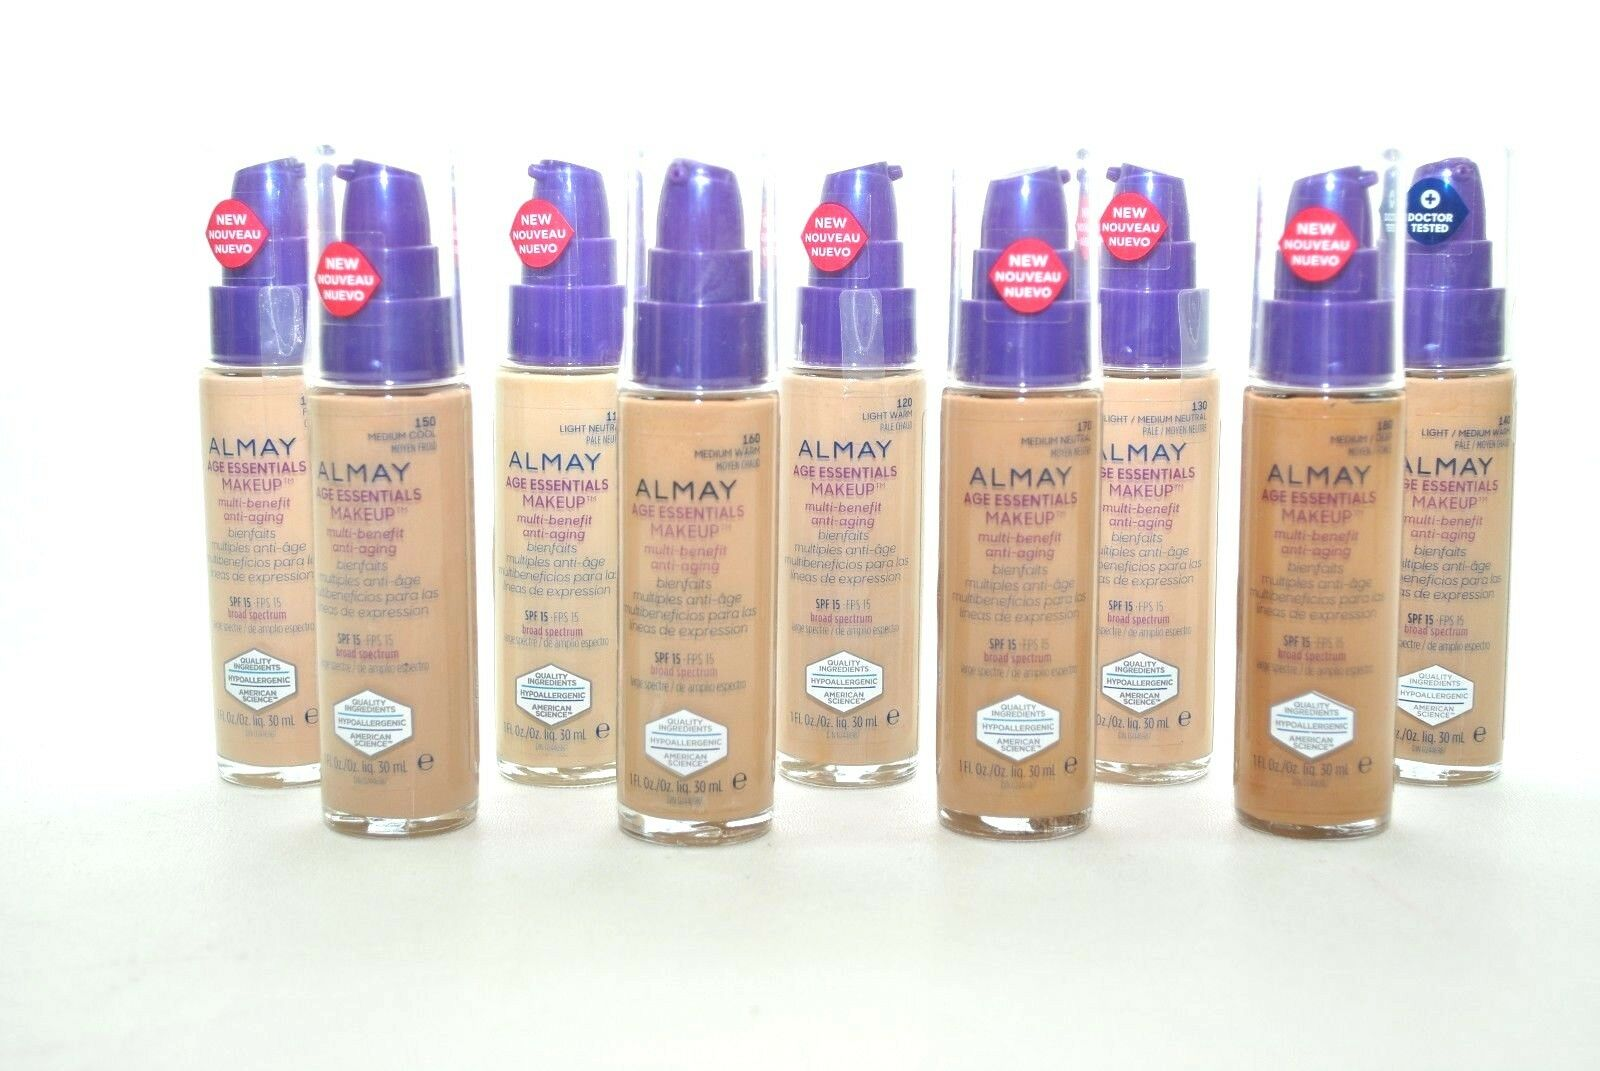 Almay Age Essentials Makeup SPF 15    -Buy 1 Get 1 30% OFF!!